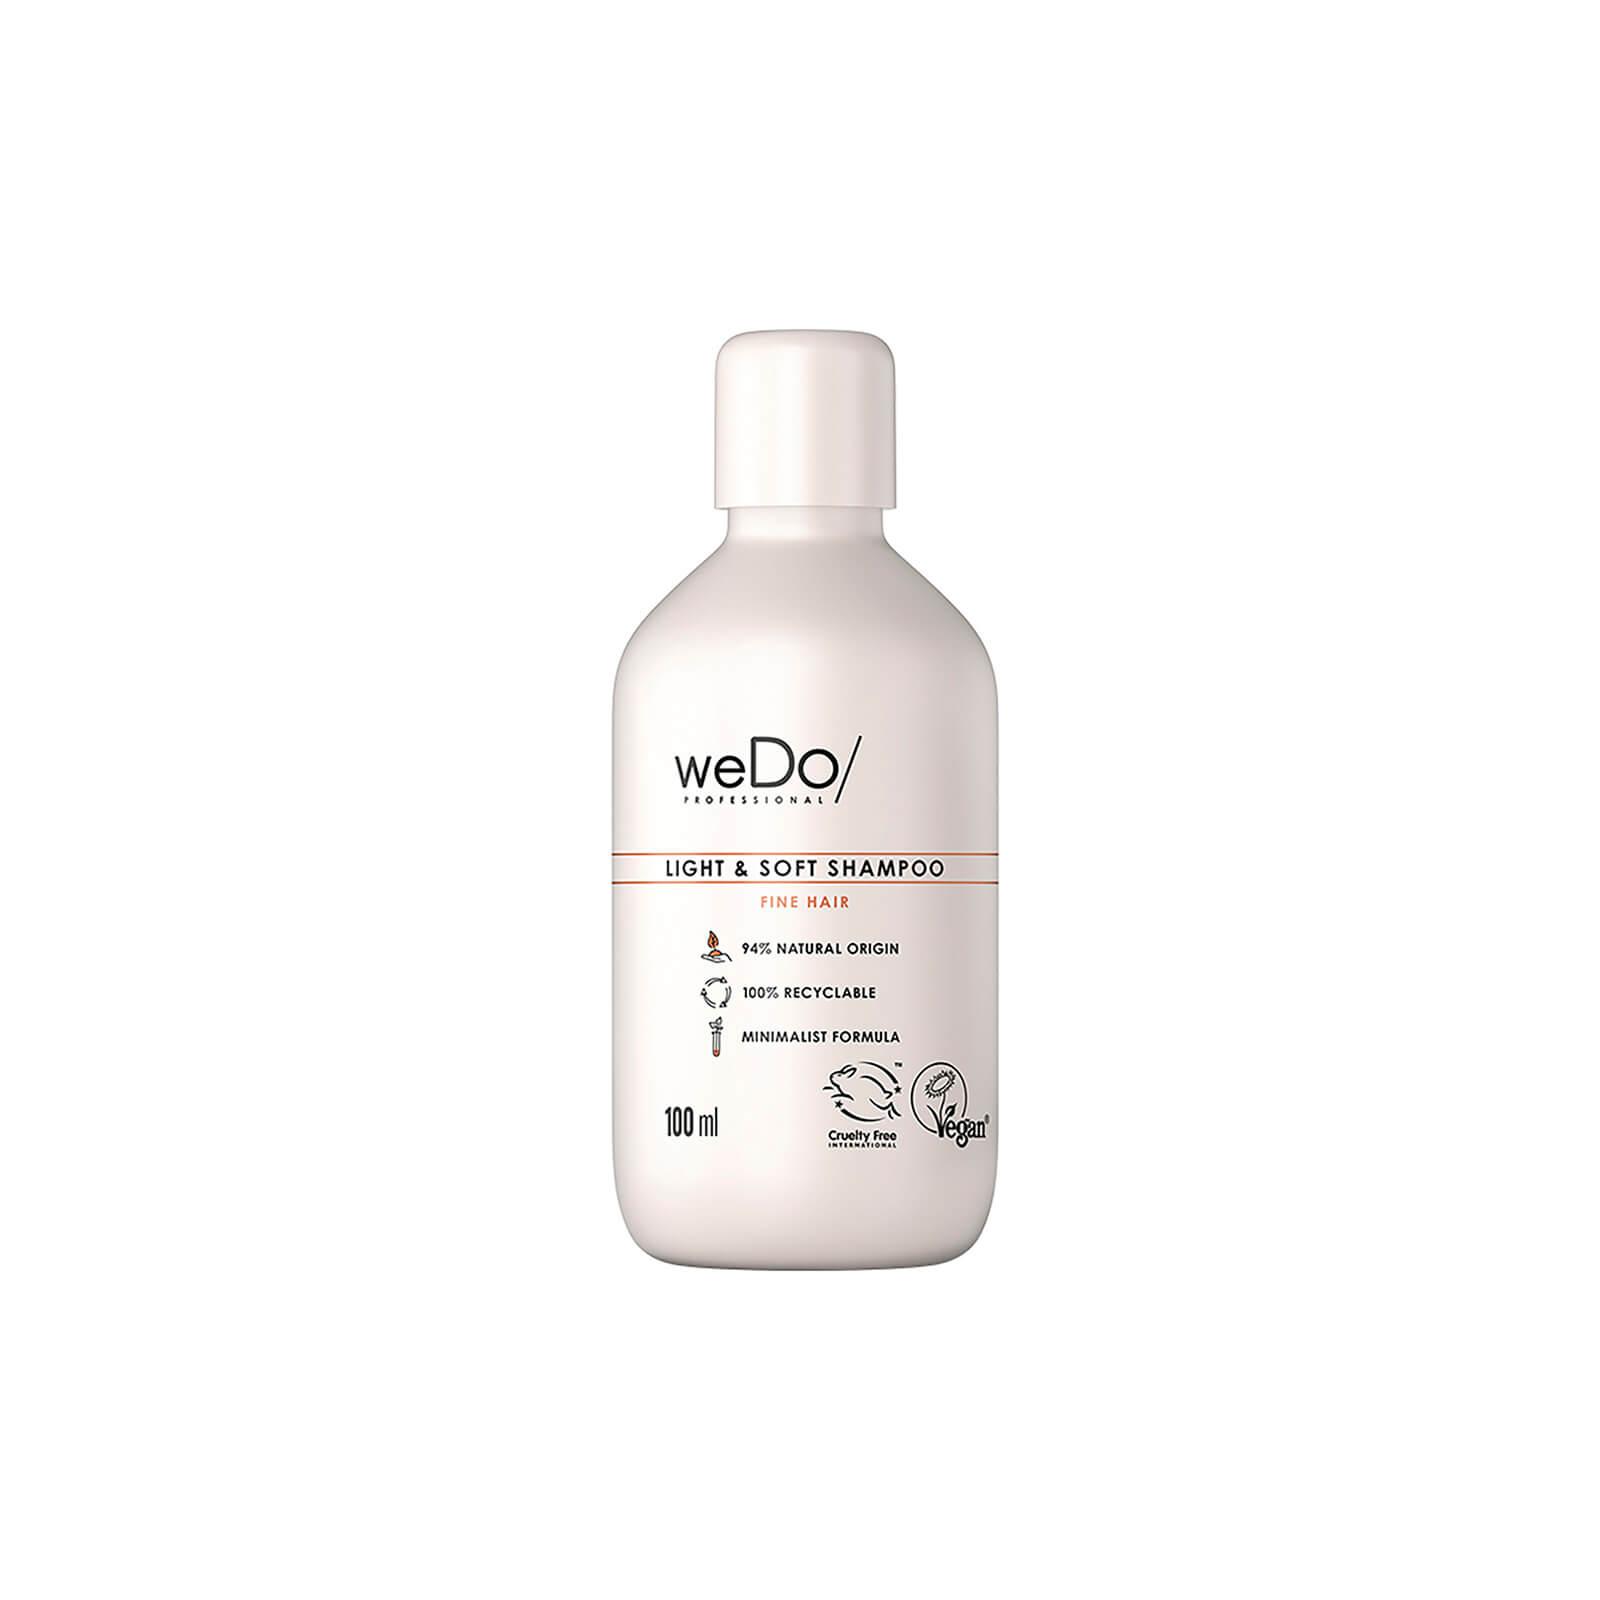 weDo/ Professional Light and Soft Shampoo 100ml